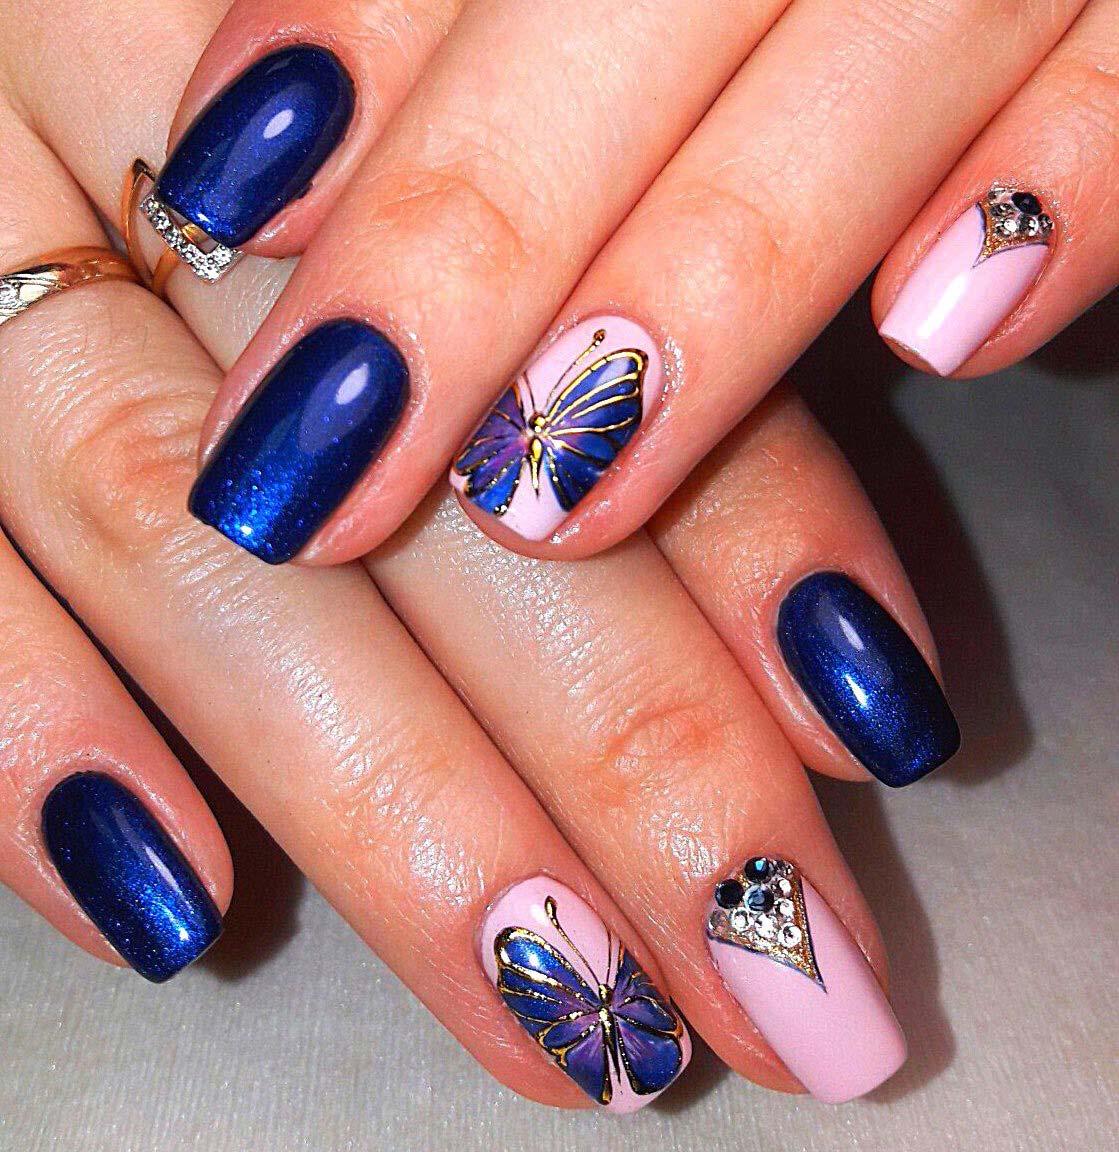 Маникюр с бабочками - 81 фото новинок дизайна ногтей